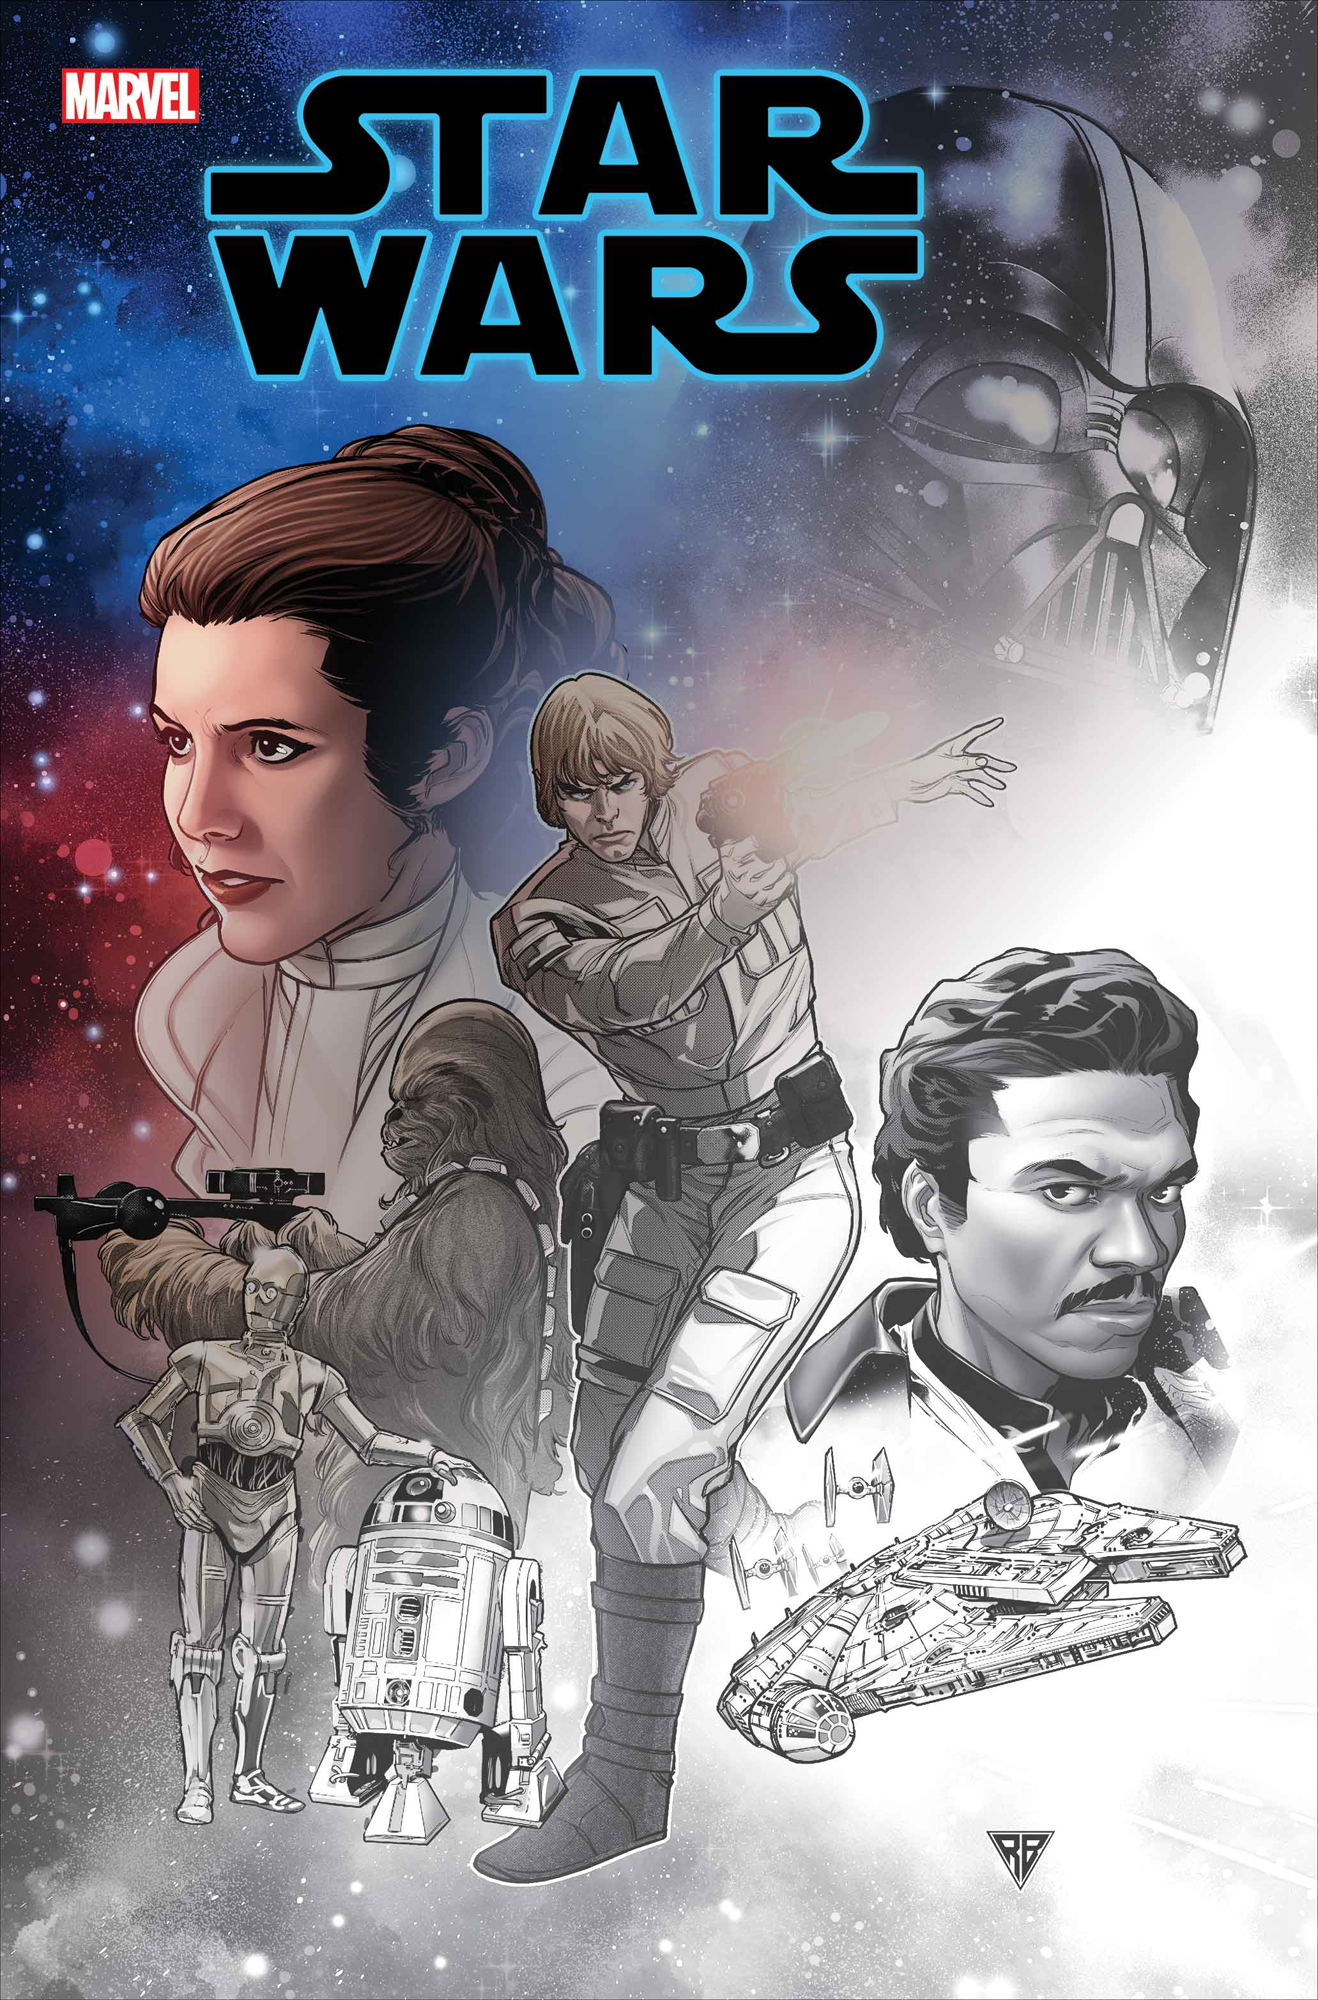 Star Wars #1 (RB Silva Premiere Variant Cover) (01.01.2020)